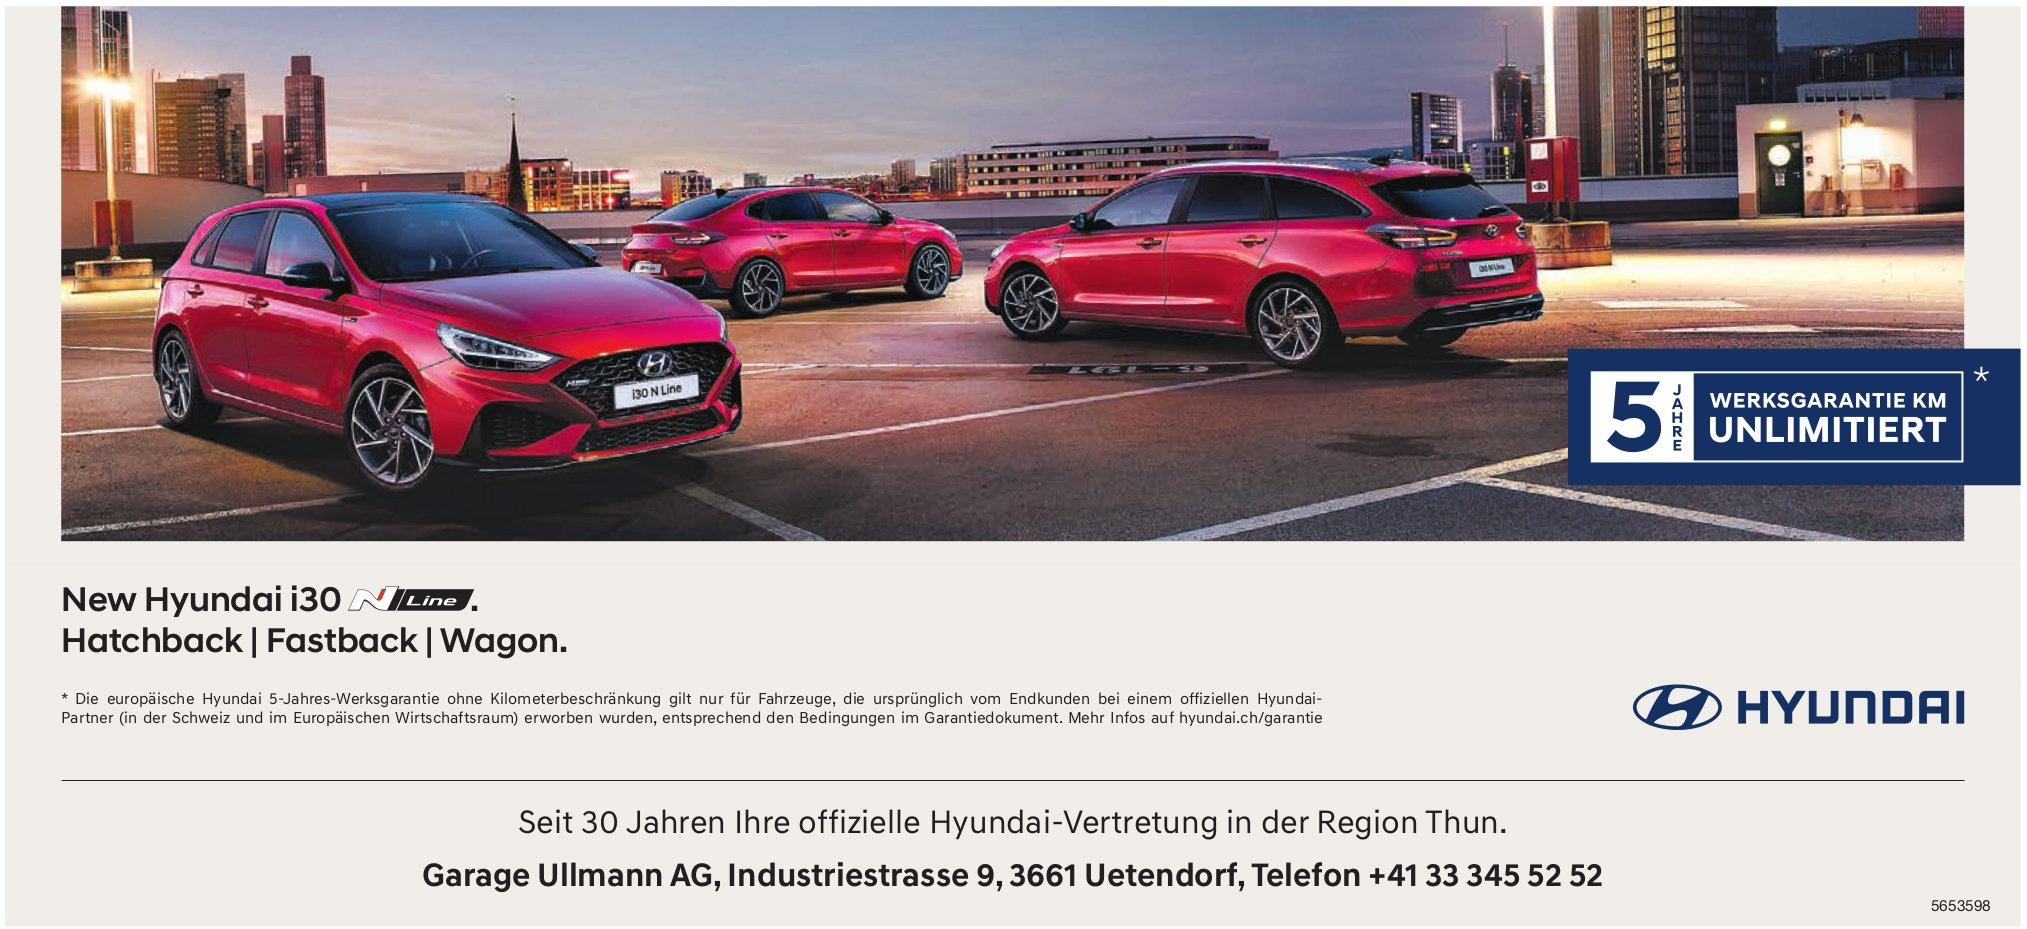 Garage Ullmann AG, Uetendorf - New Hyundai i30 . Hatchback | Fastback | Wagon.